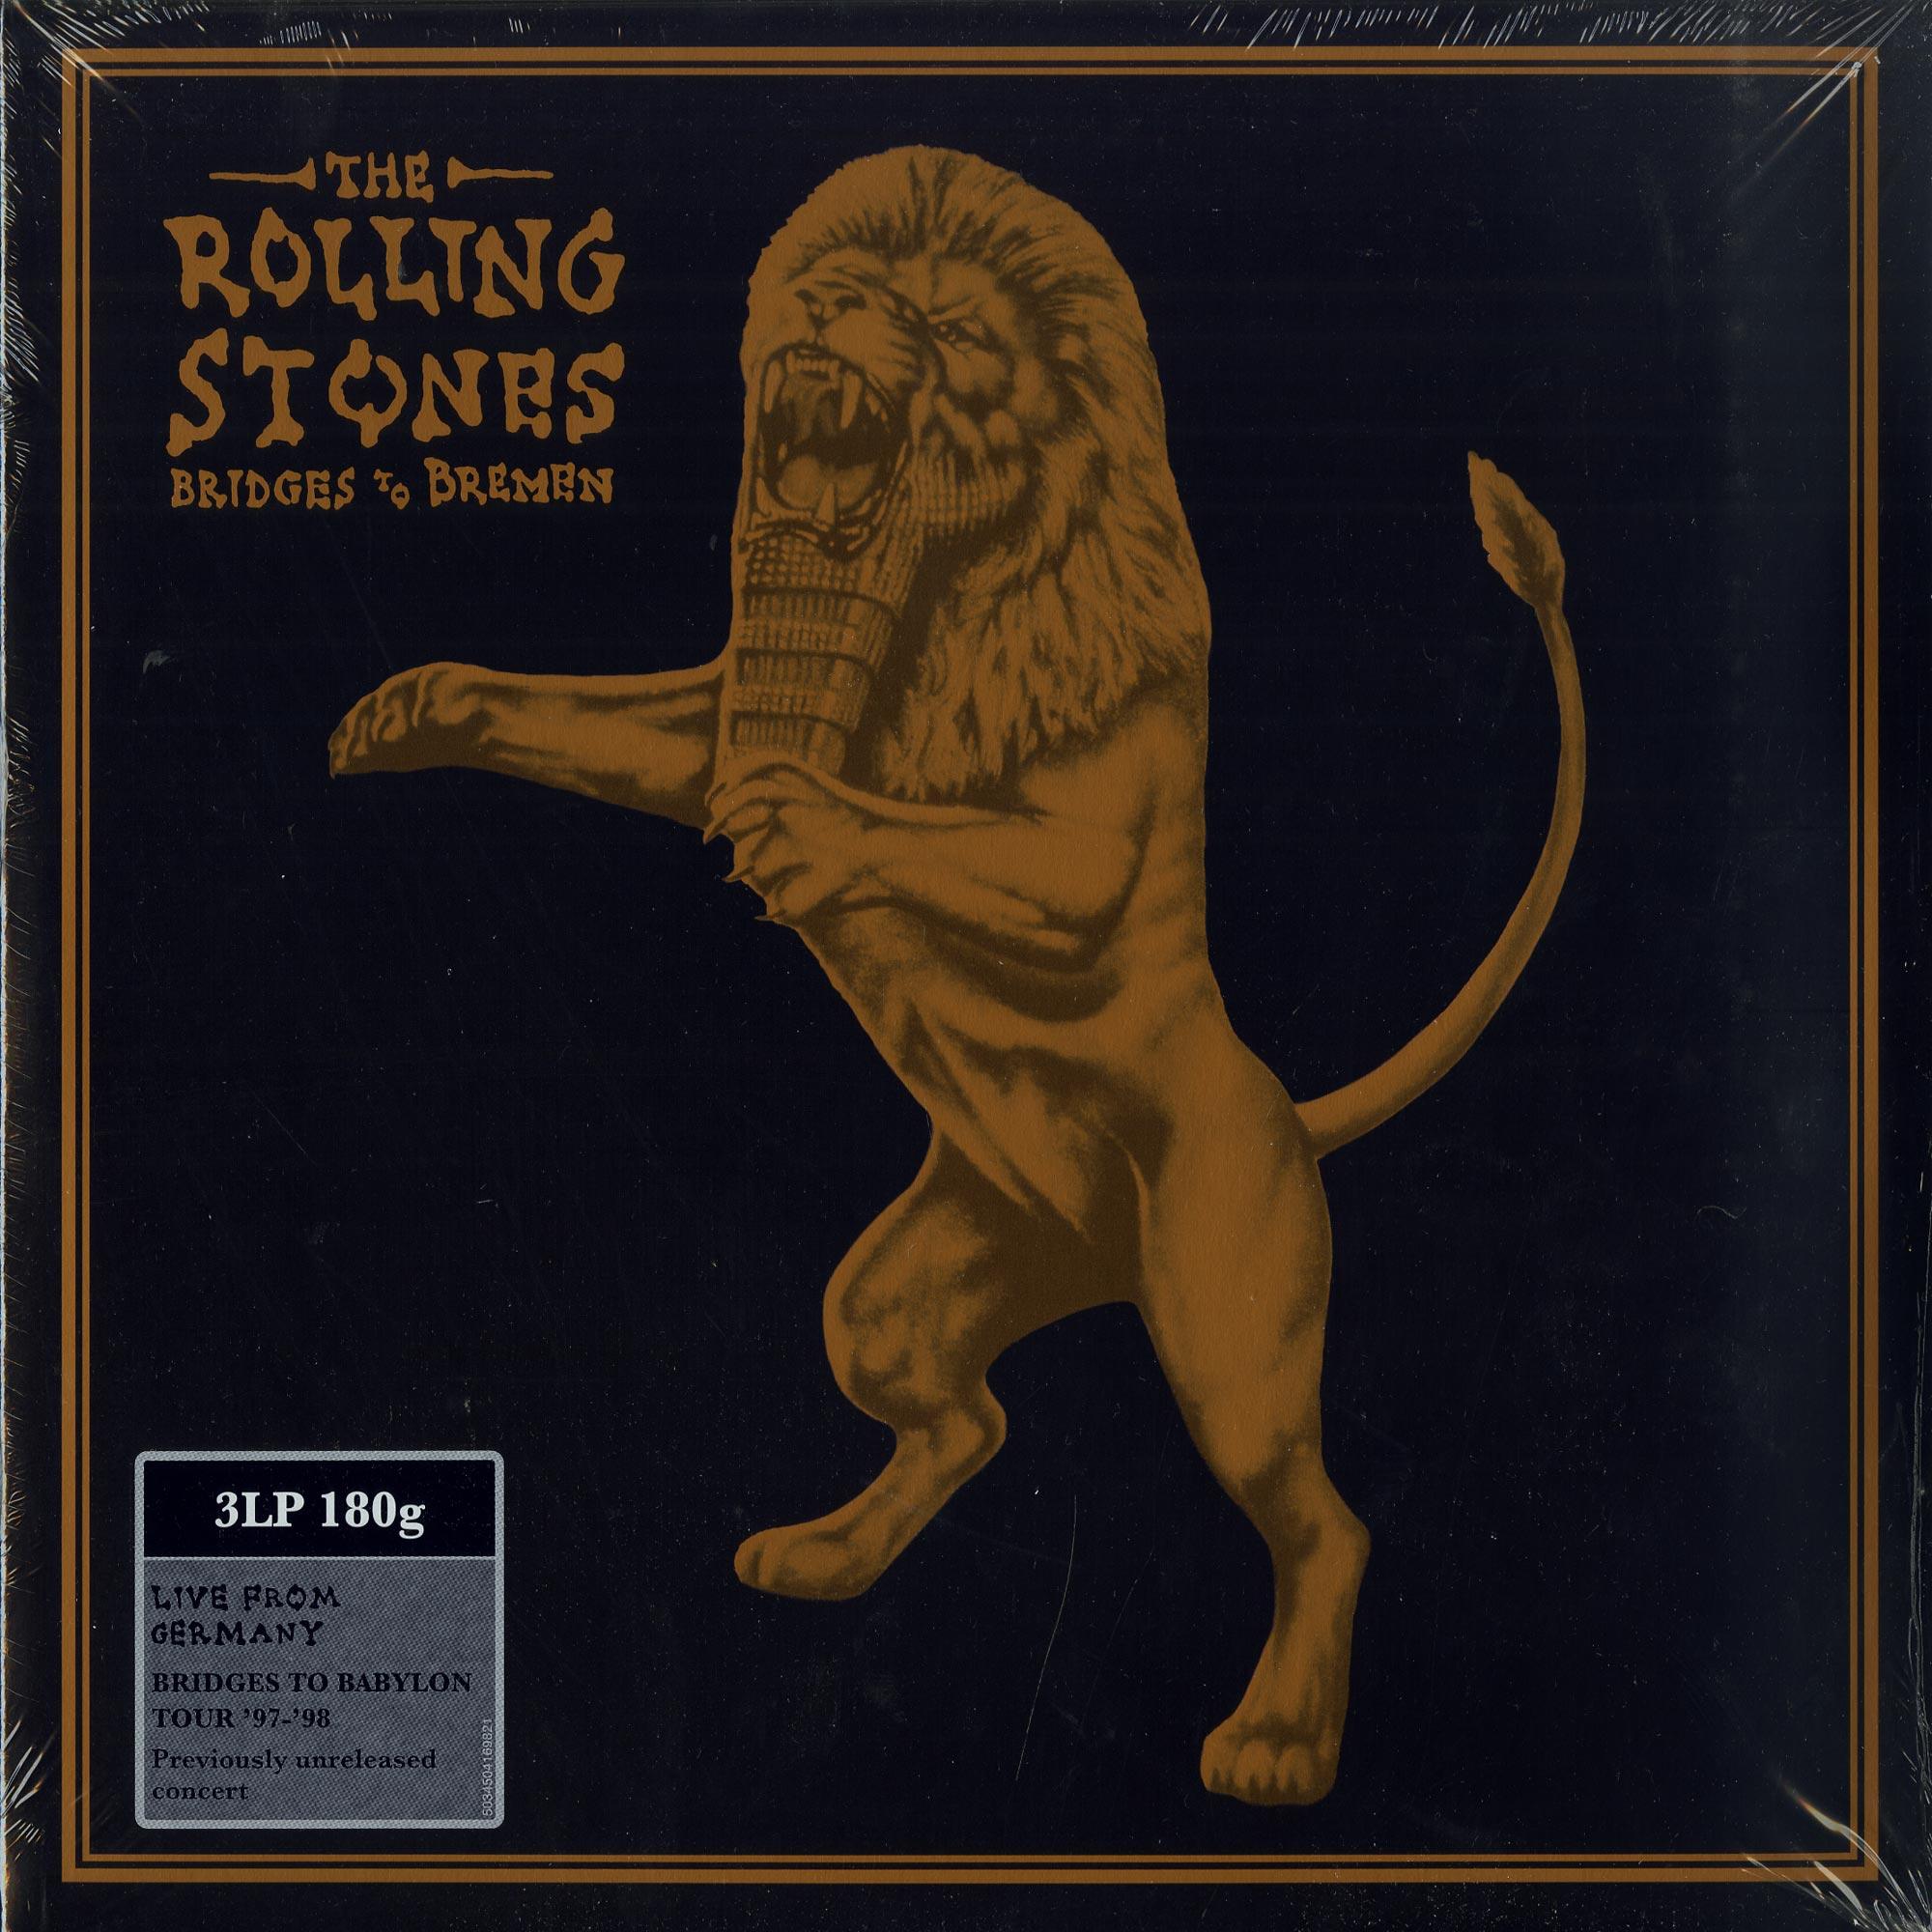 The Rolling Stones - BRIDGES TO BREMEN